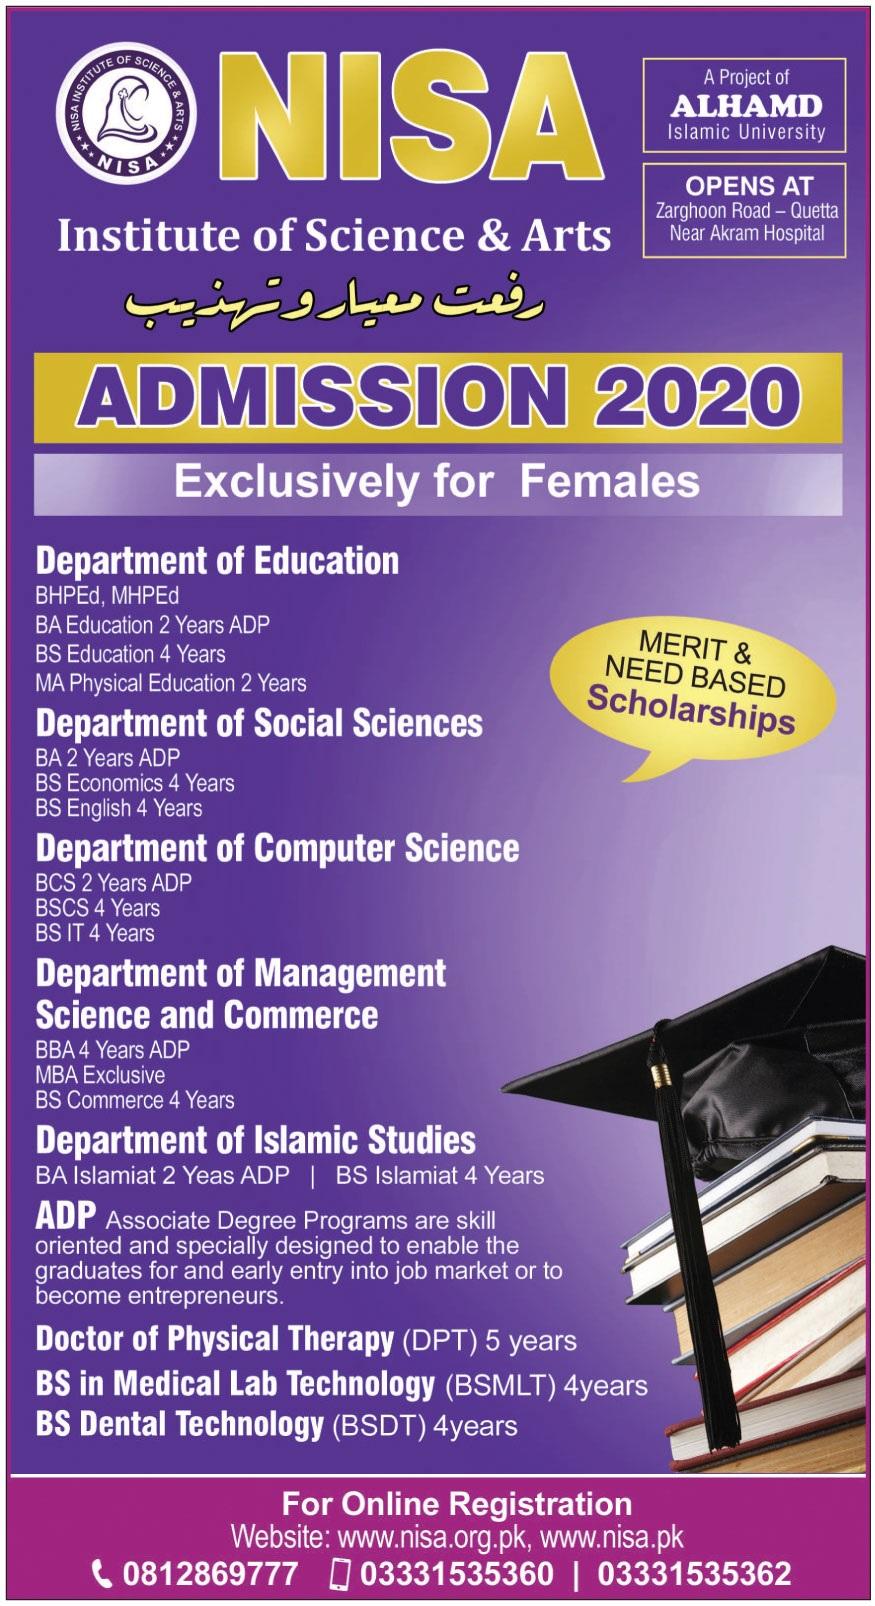 Nisa Institute Of Science & Arts Pakistan Admissions